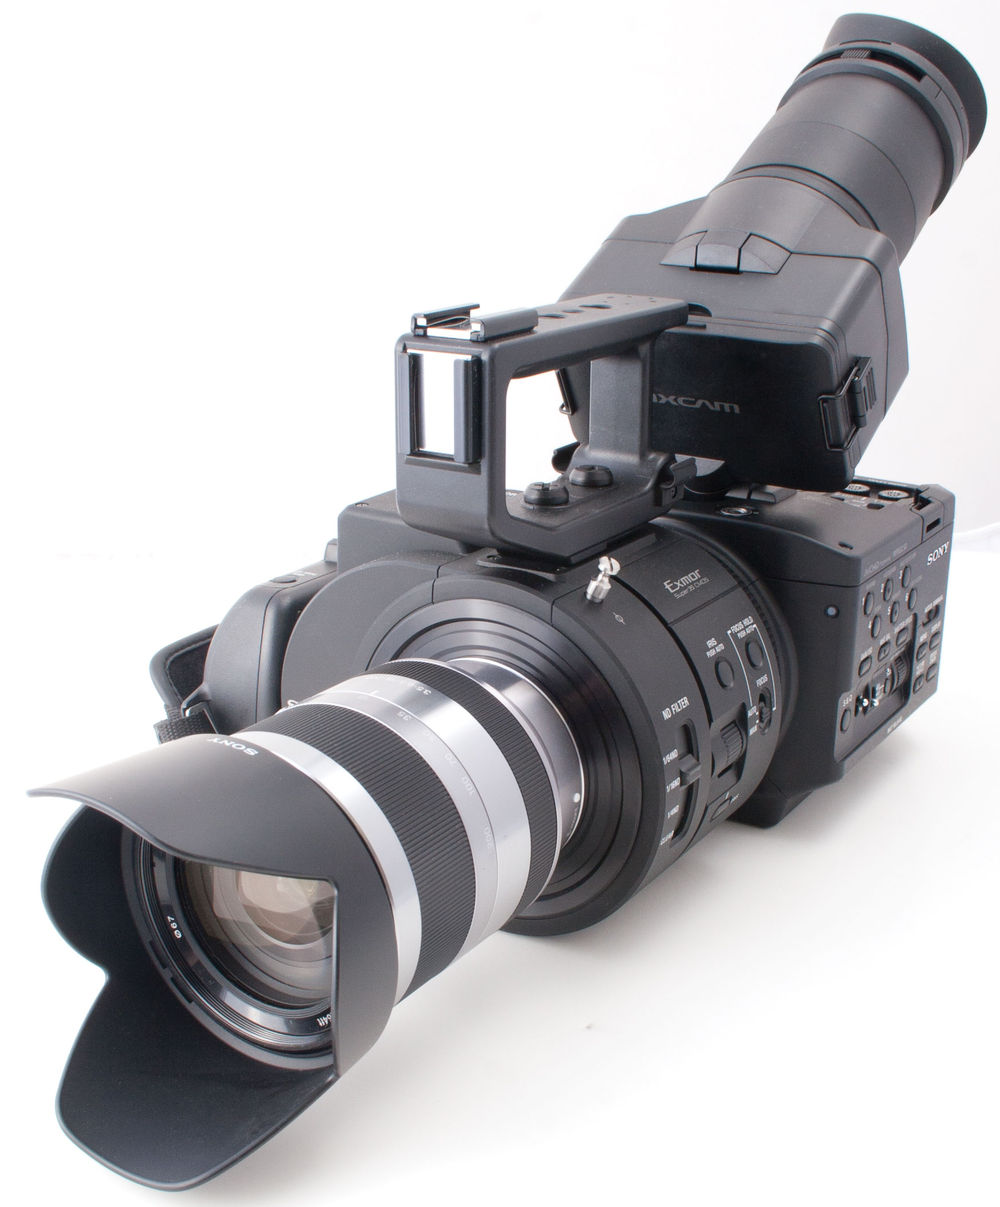 Sony-FS700-camcorder